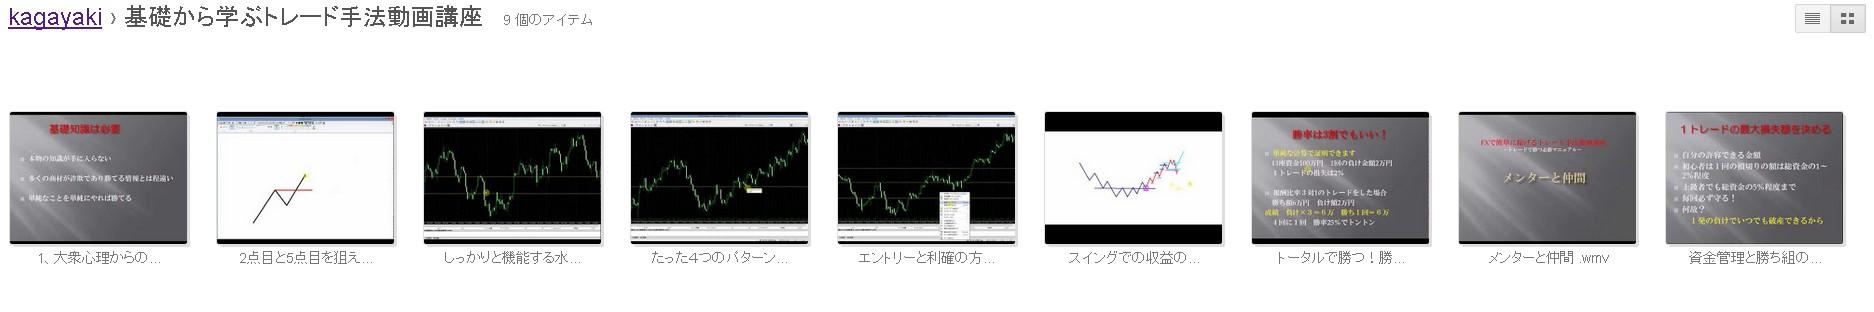 2014-09-04_18h06_56.jpg